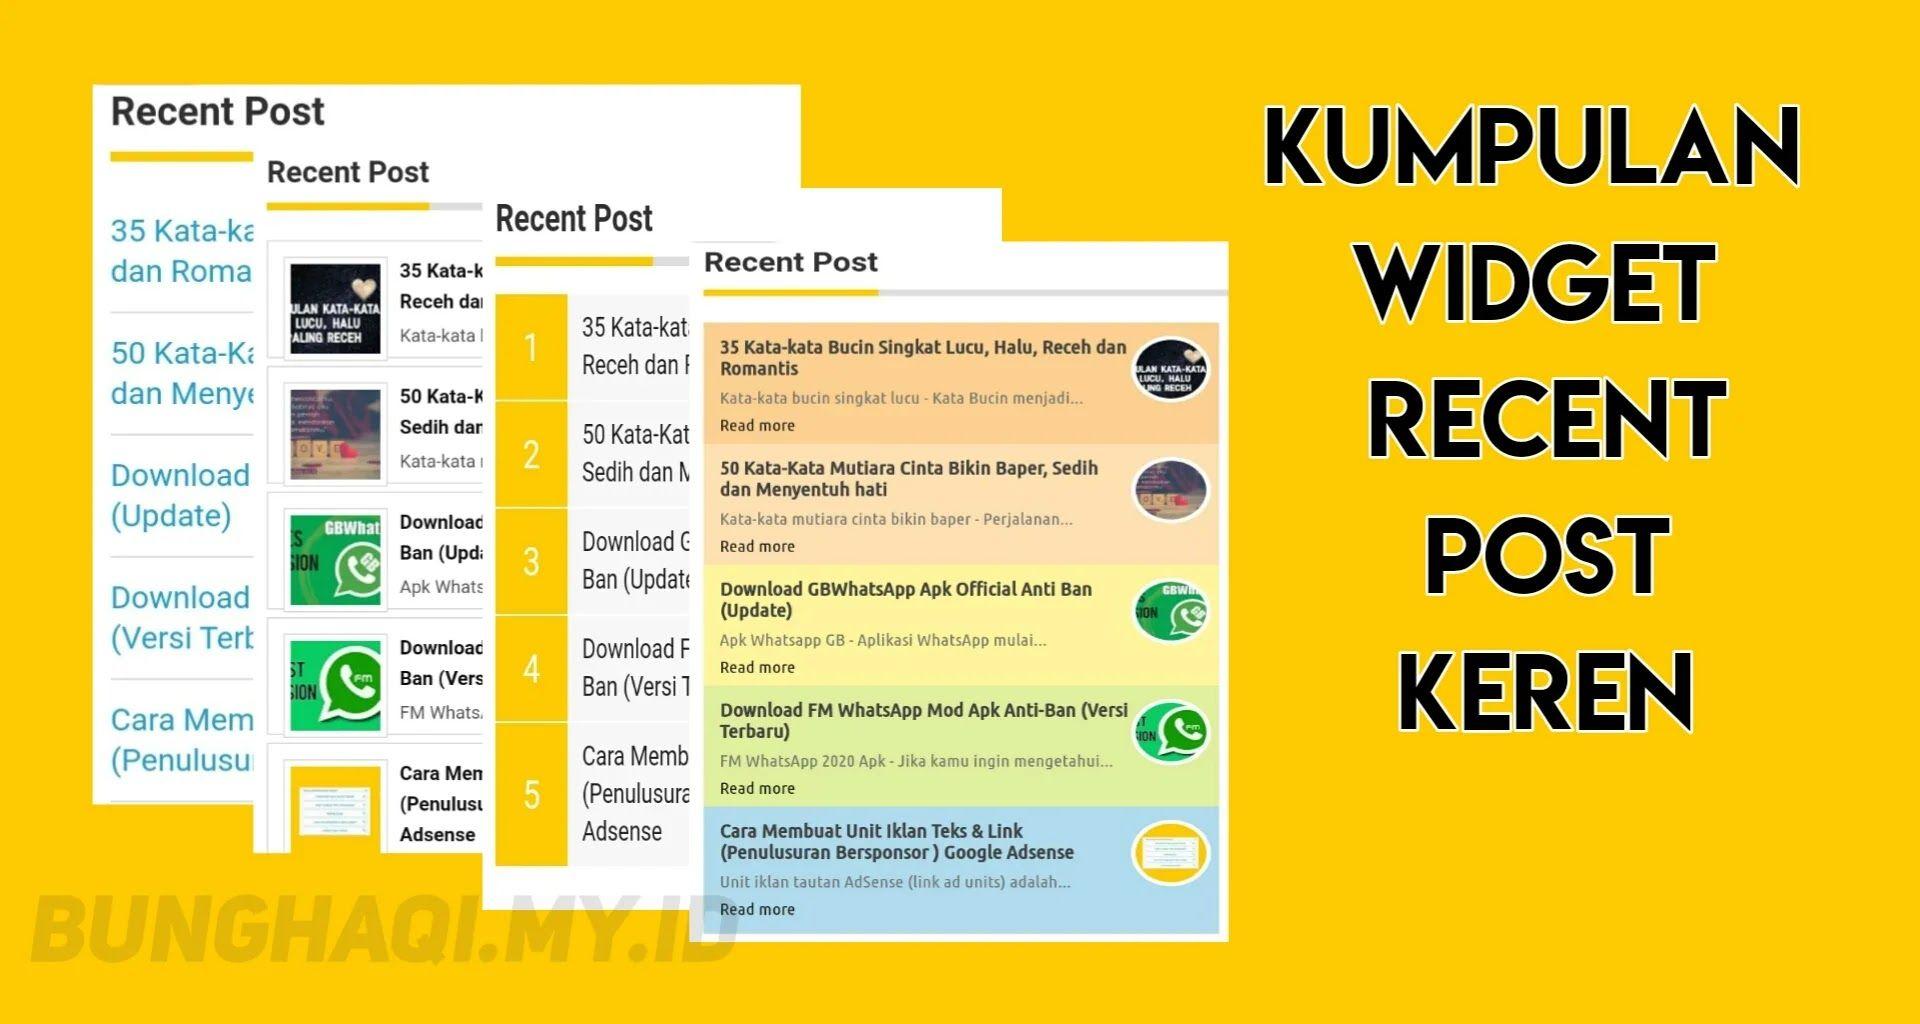 Cara Membuat Recent Post Keren Tips Blogging Script Blogging